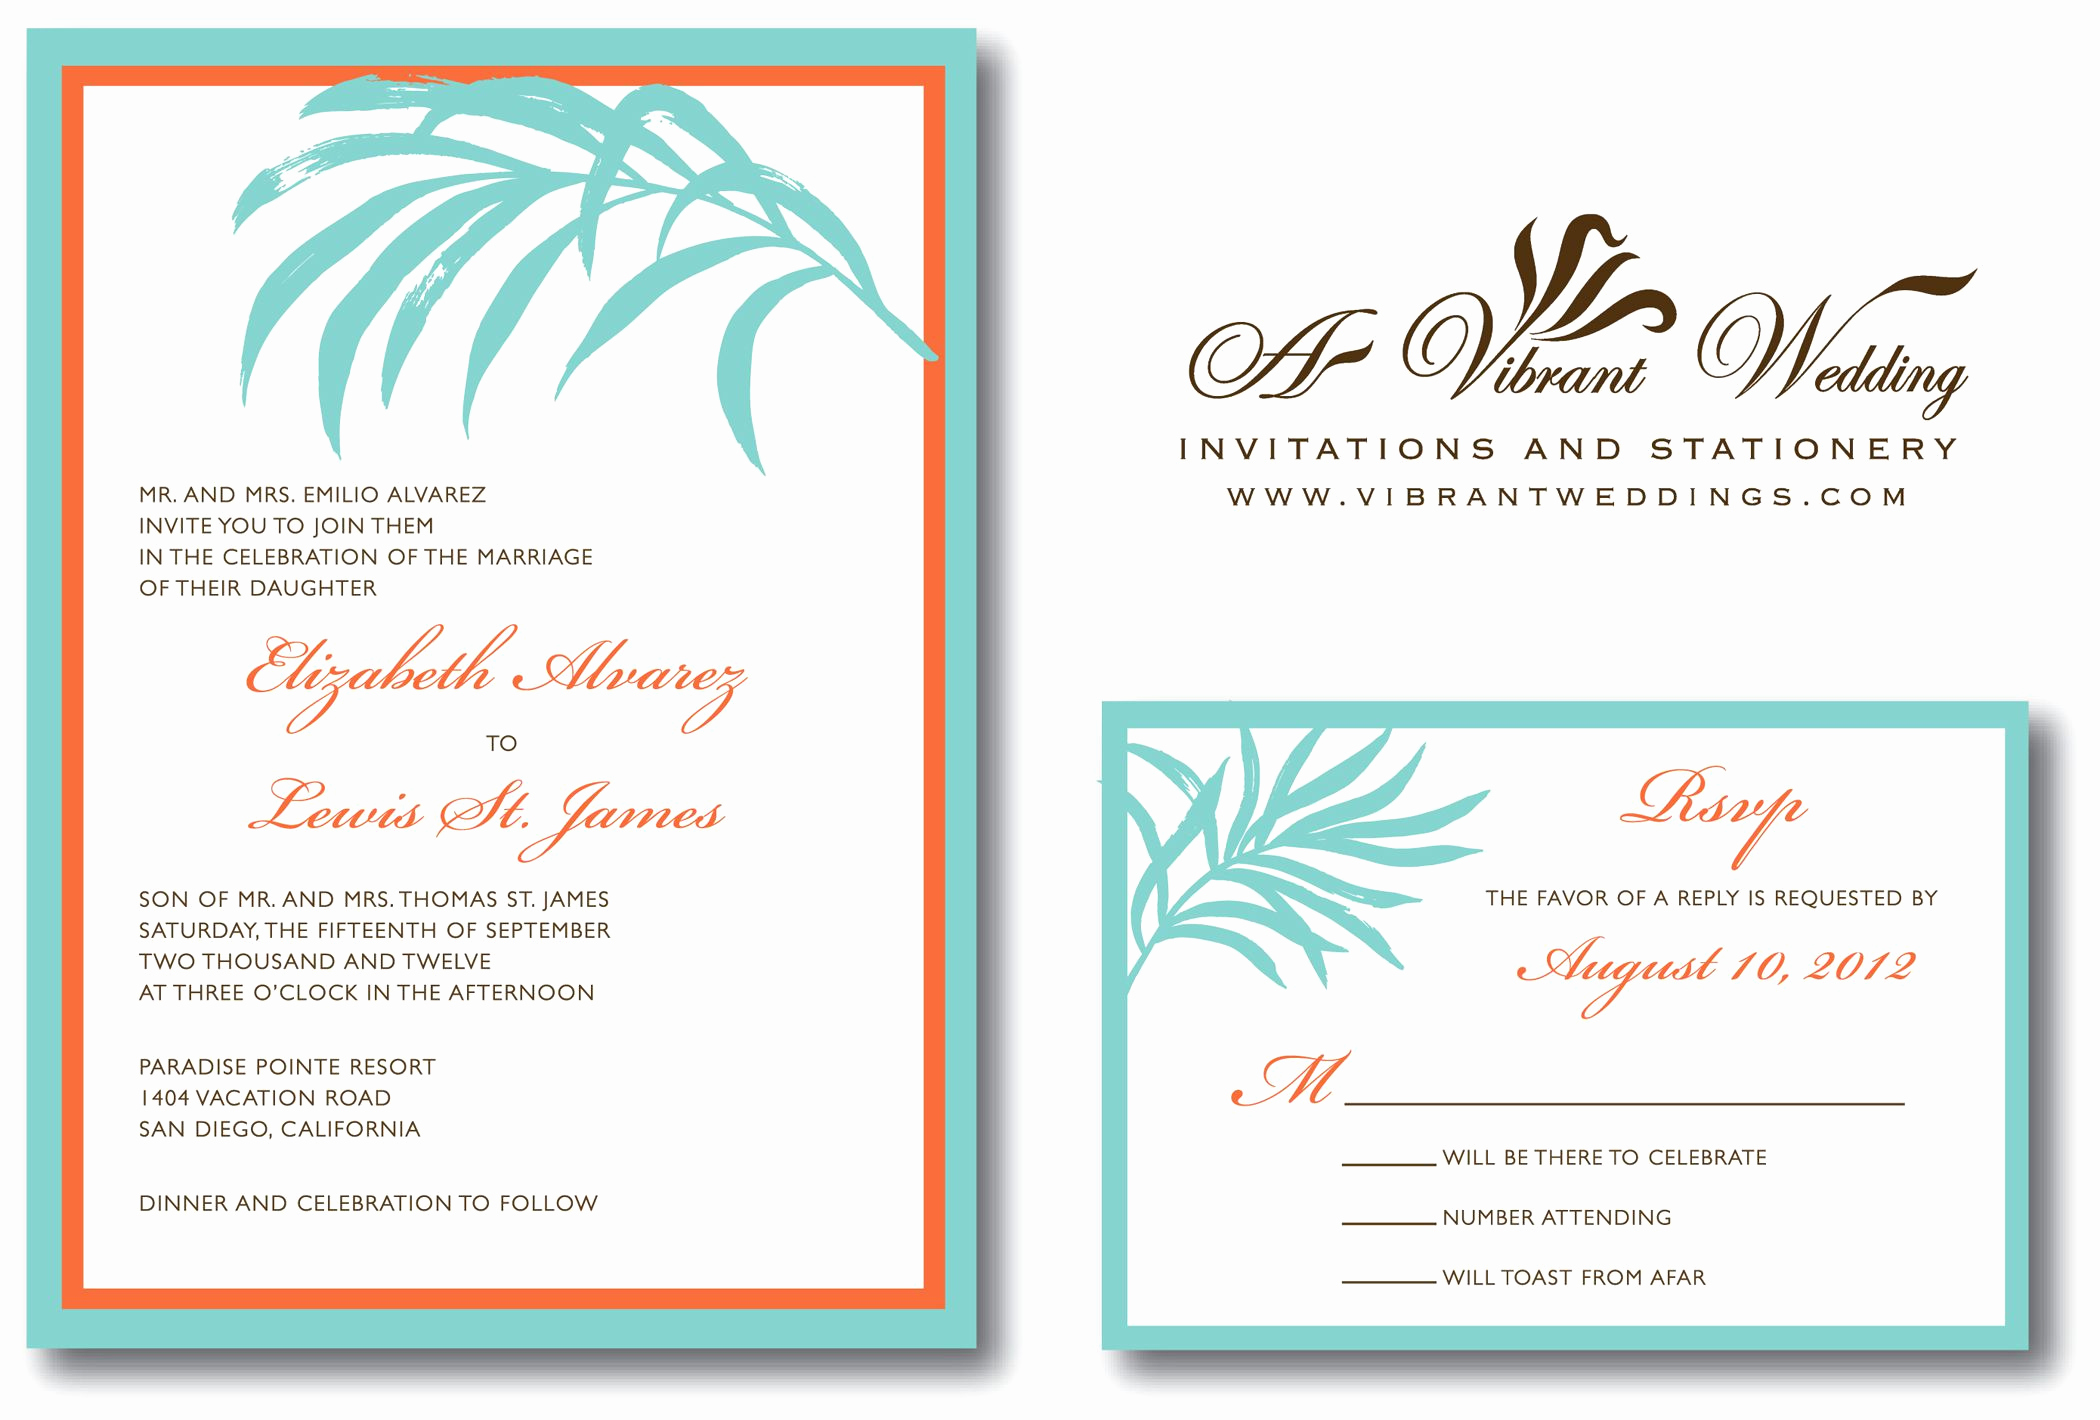 Beach Wedding Invitation Wording Awesome Beach Wedding Invitations Wording Beach Wedding